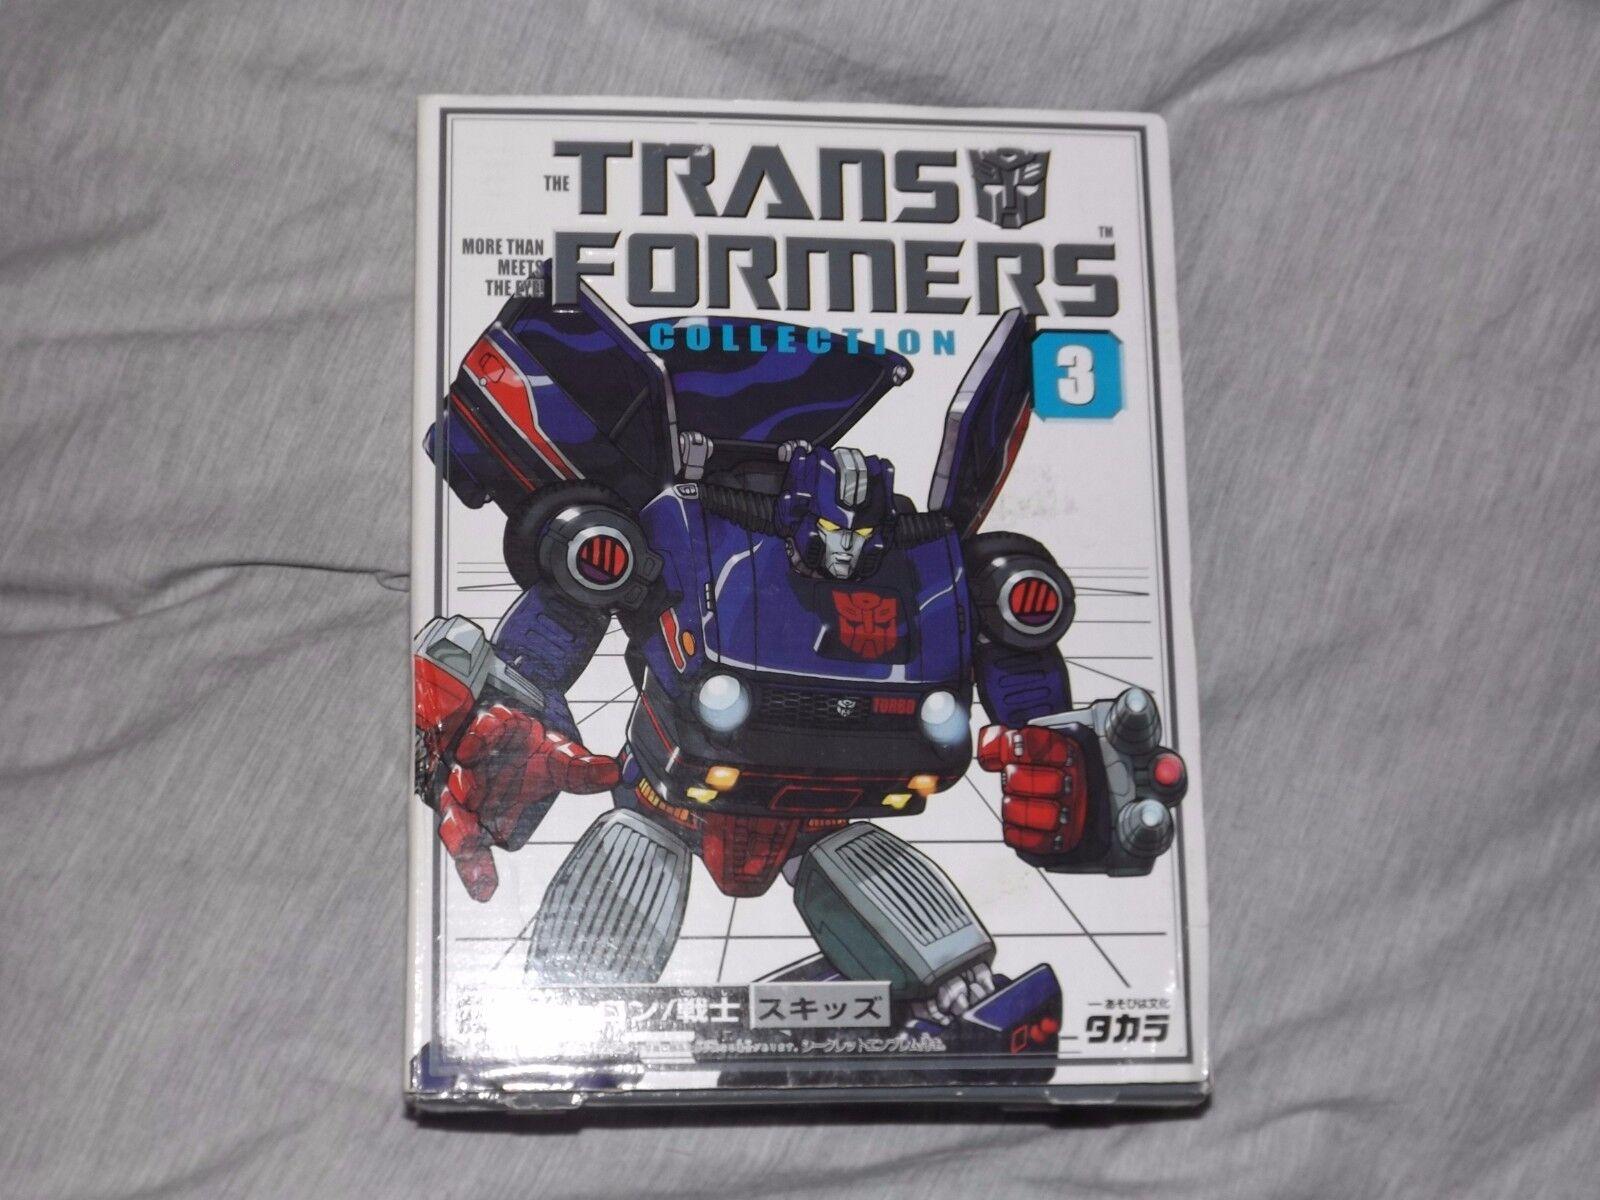 Transformers Collection 3 Takara Skids